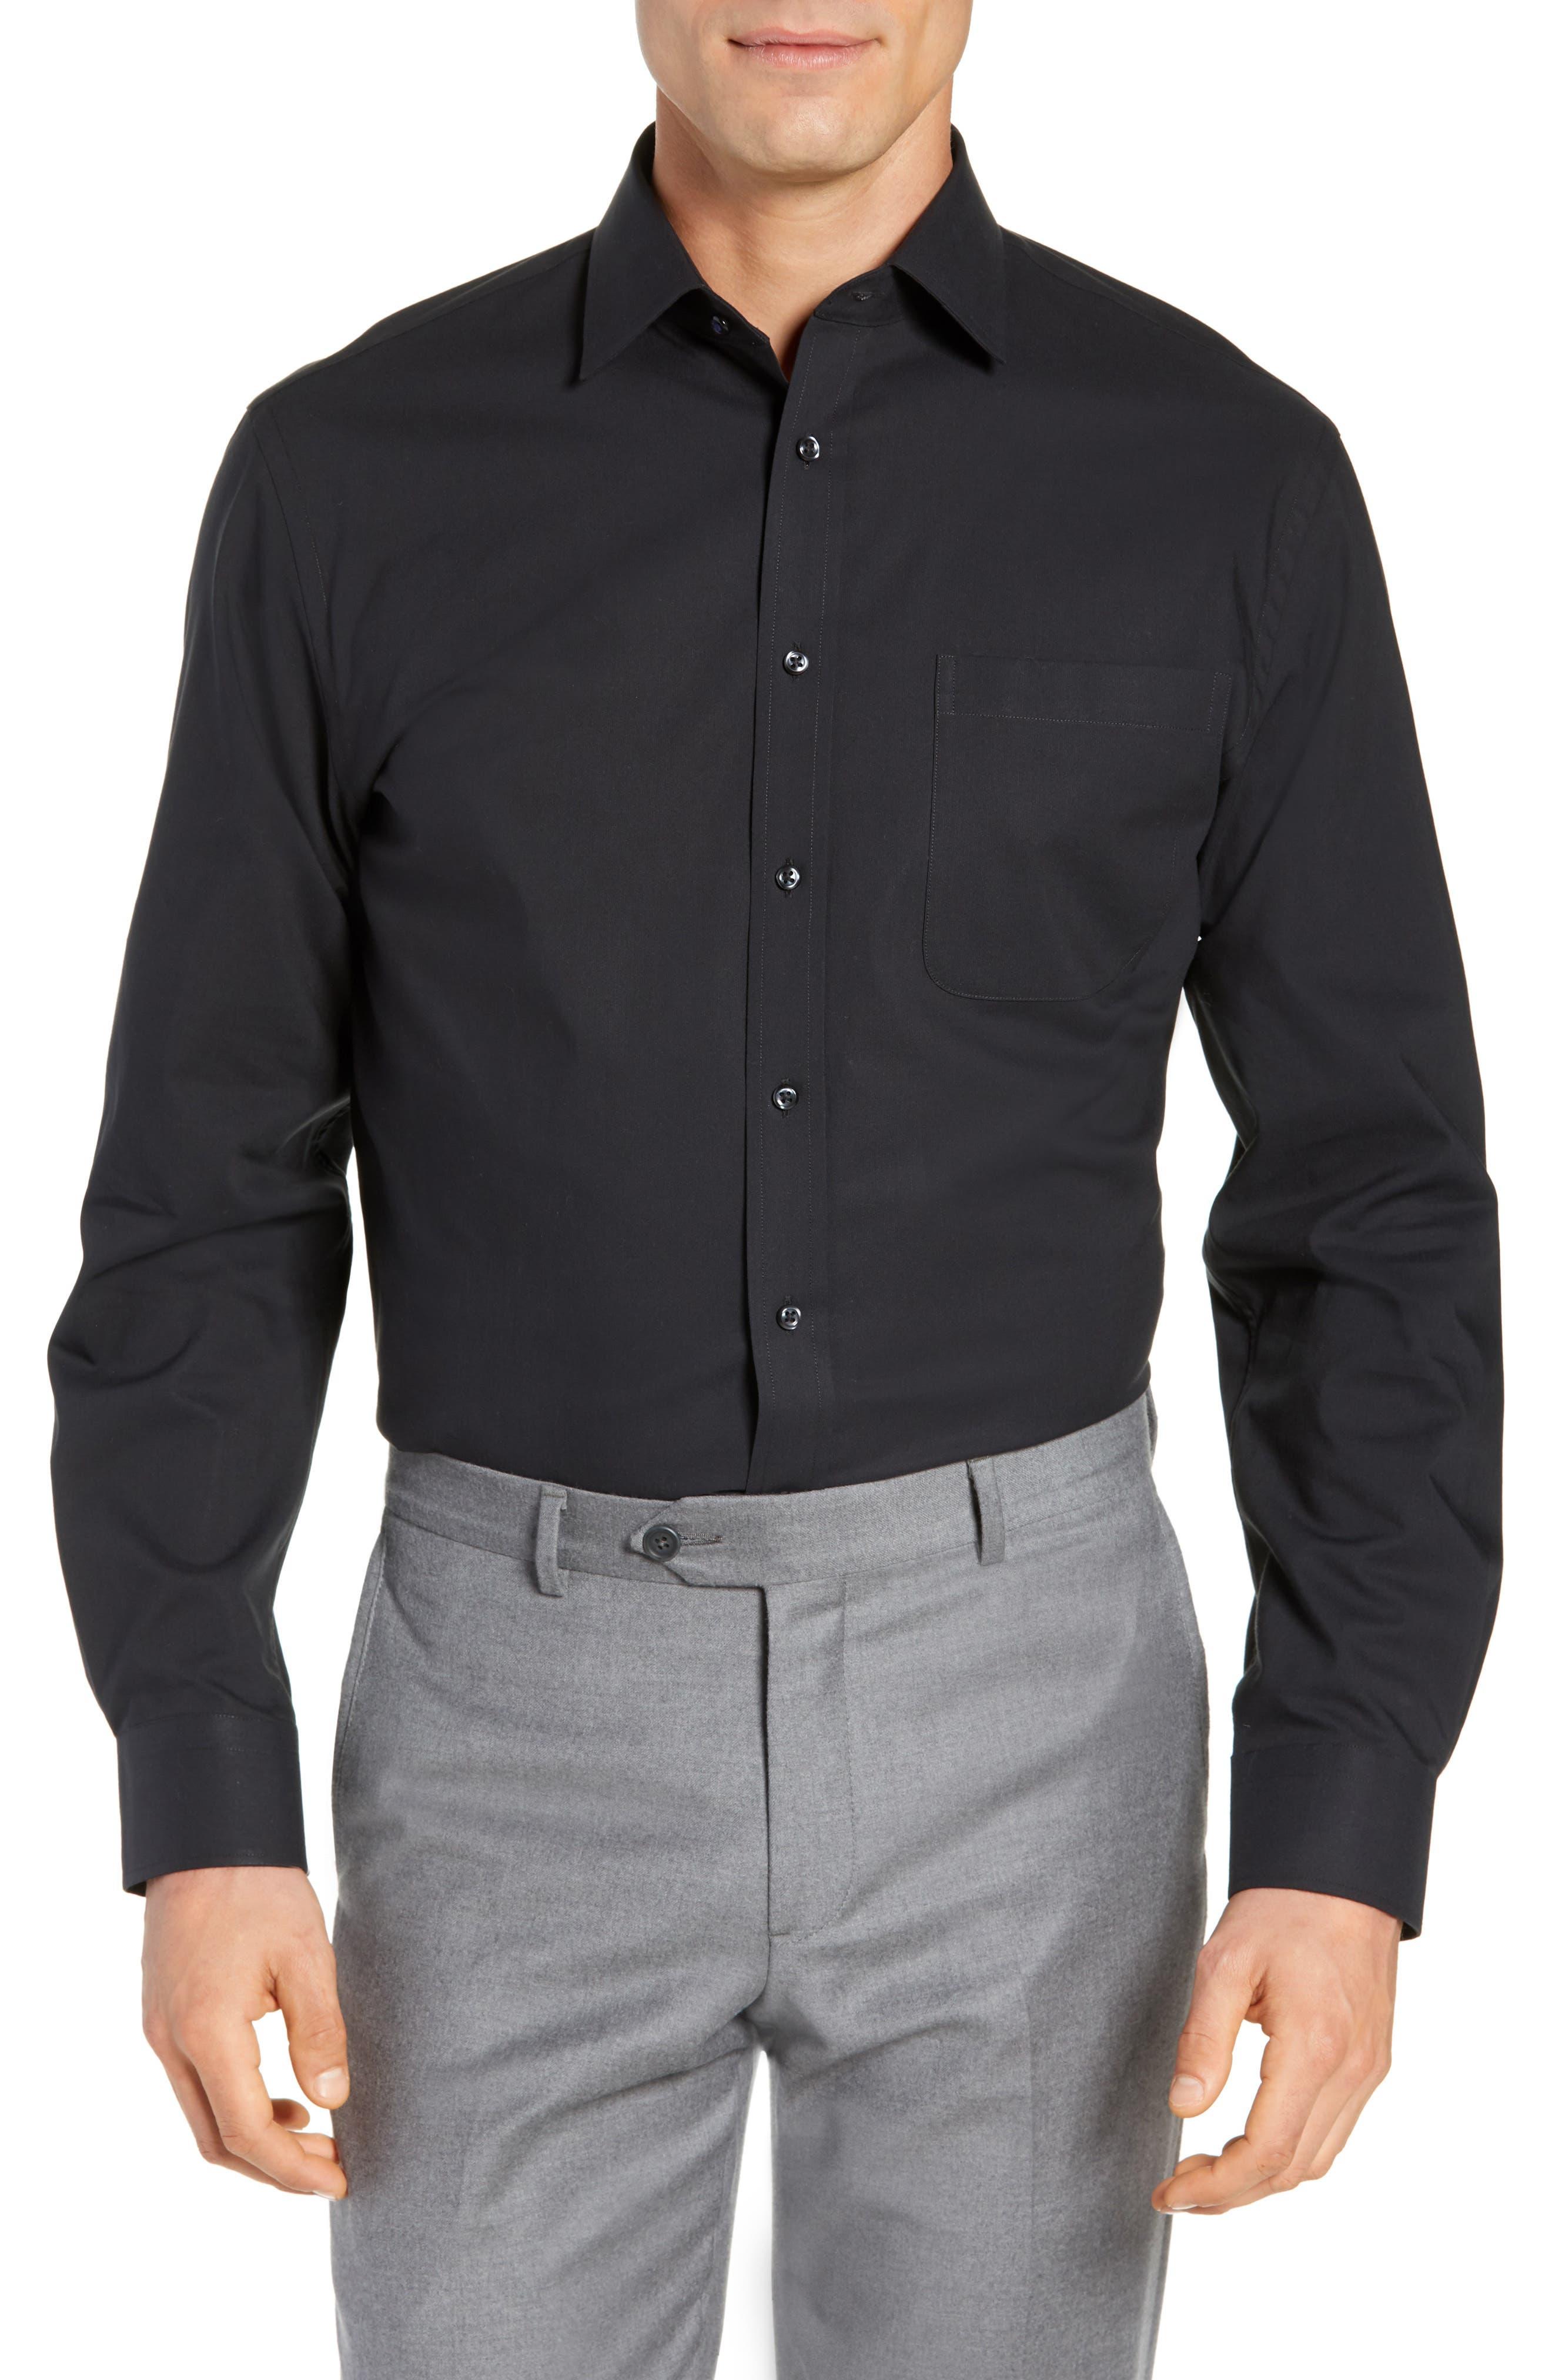 NORDSTROM MEN'S SHOP, Tech-Smart Traditional Fit Stretch Pinpoint Dress Shirt, Main thumbnail 1, color, BLACK ROCK